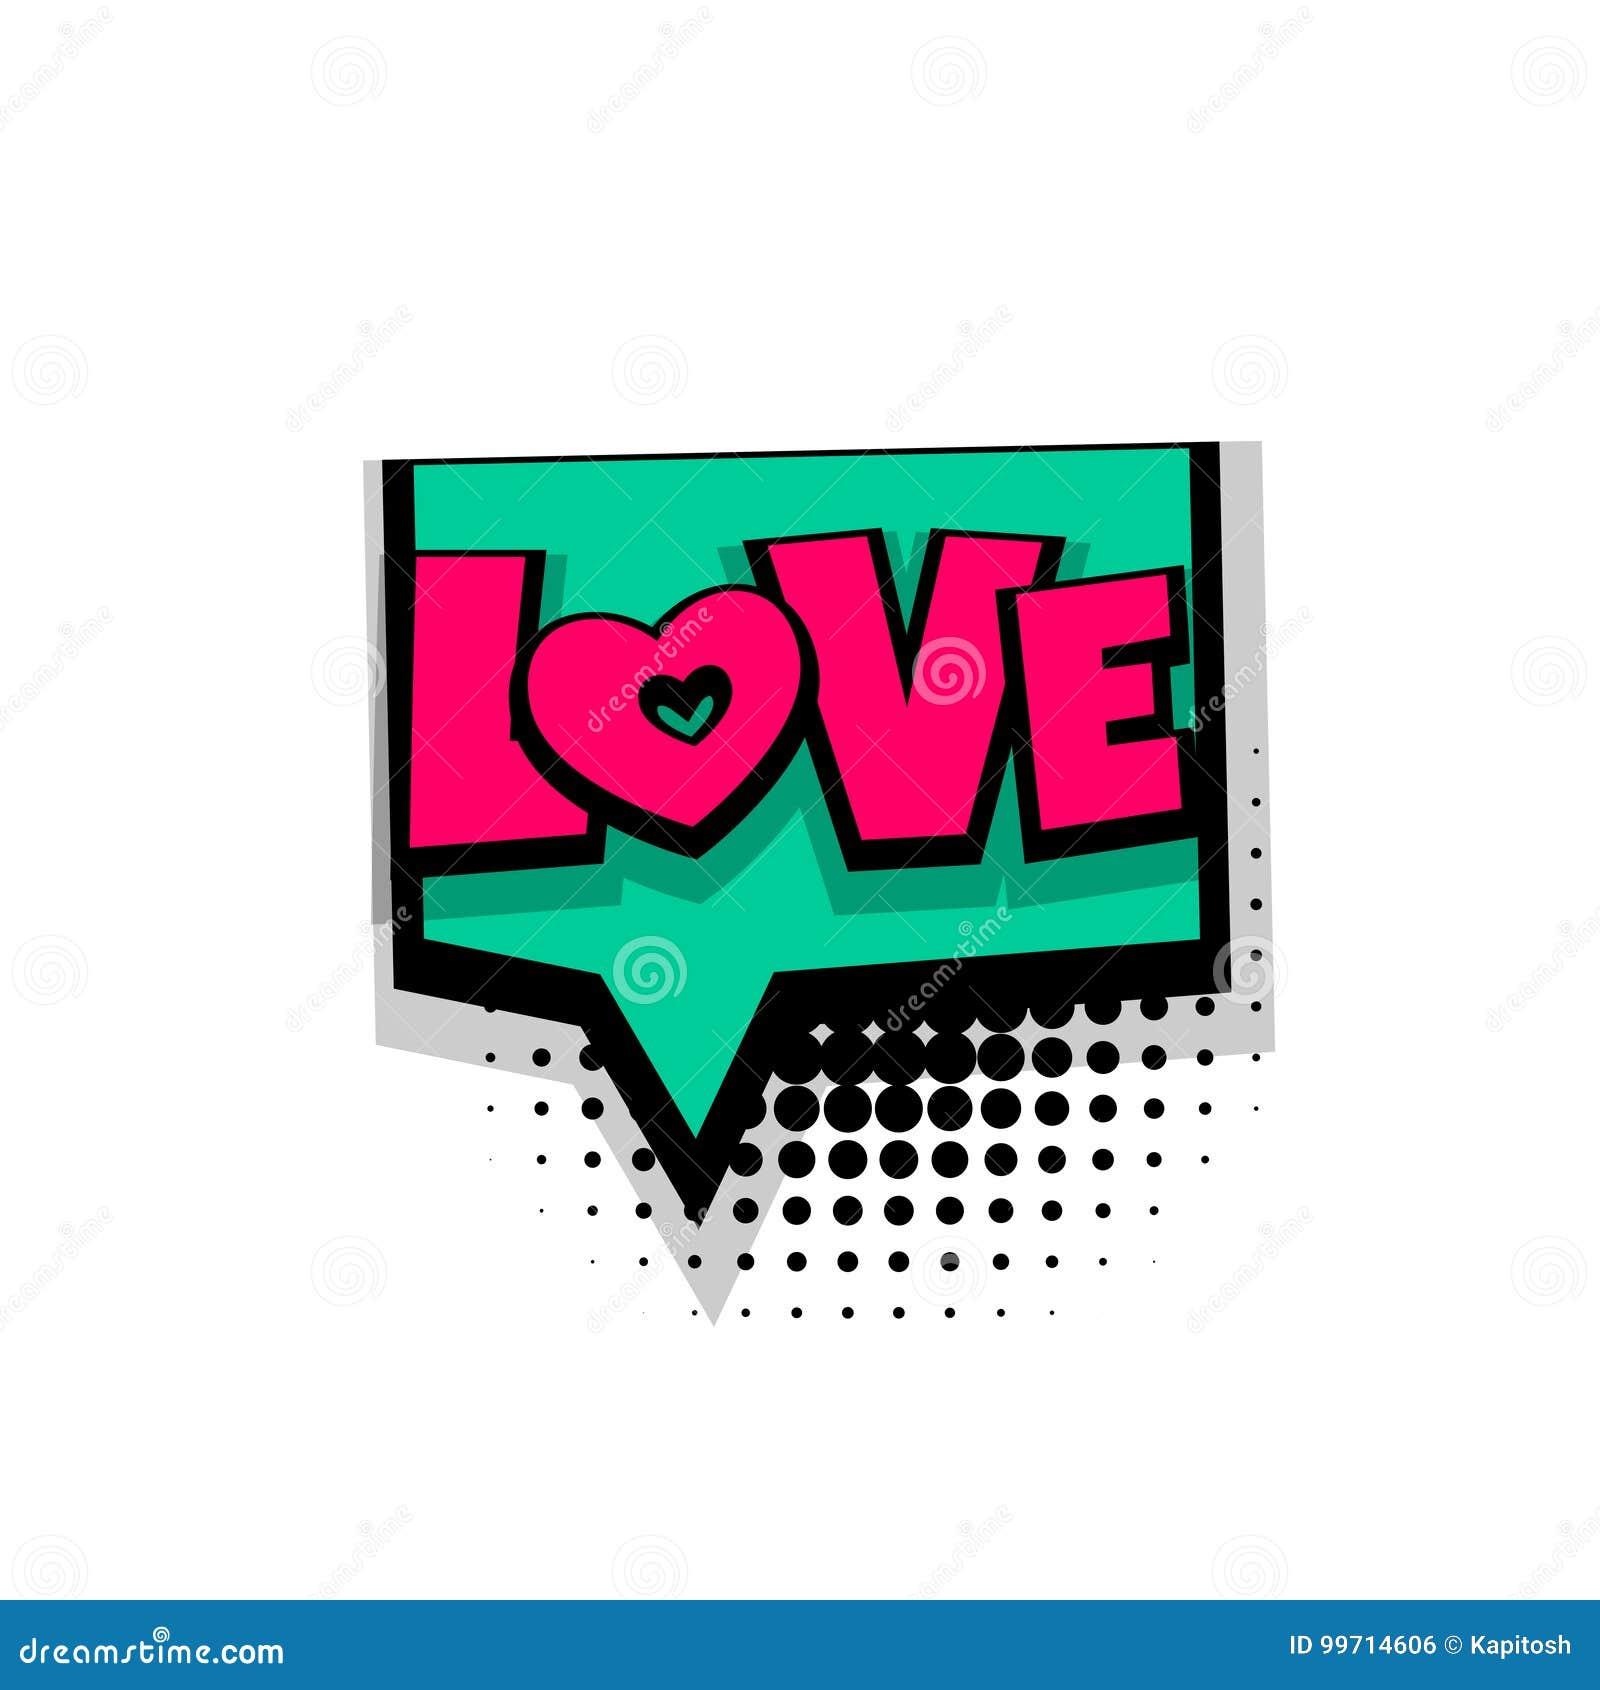 Amor Comico Del Arte Pop De La Frase Del Texto Ilustracion Del